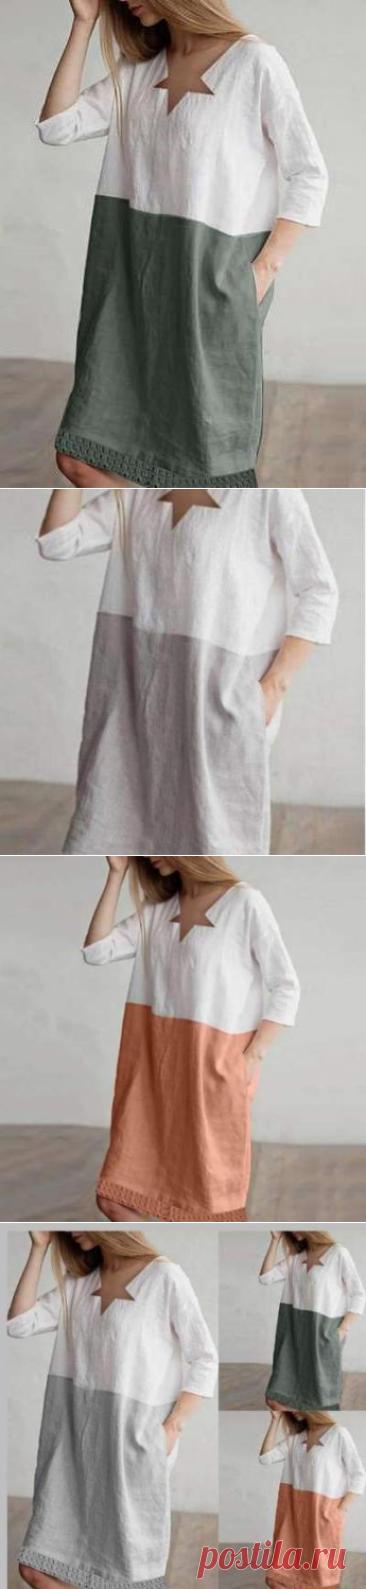 $ 27.96 - Fashion Loose Cotton Gored V neck Shift Dresses - www.clothingi.com